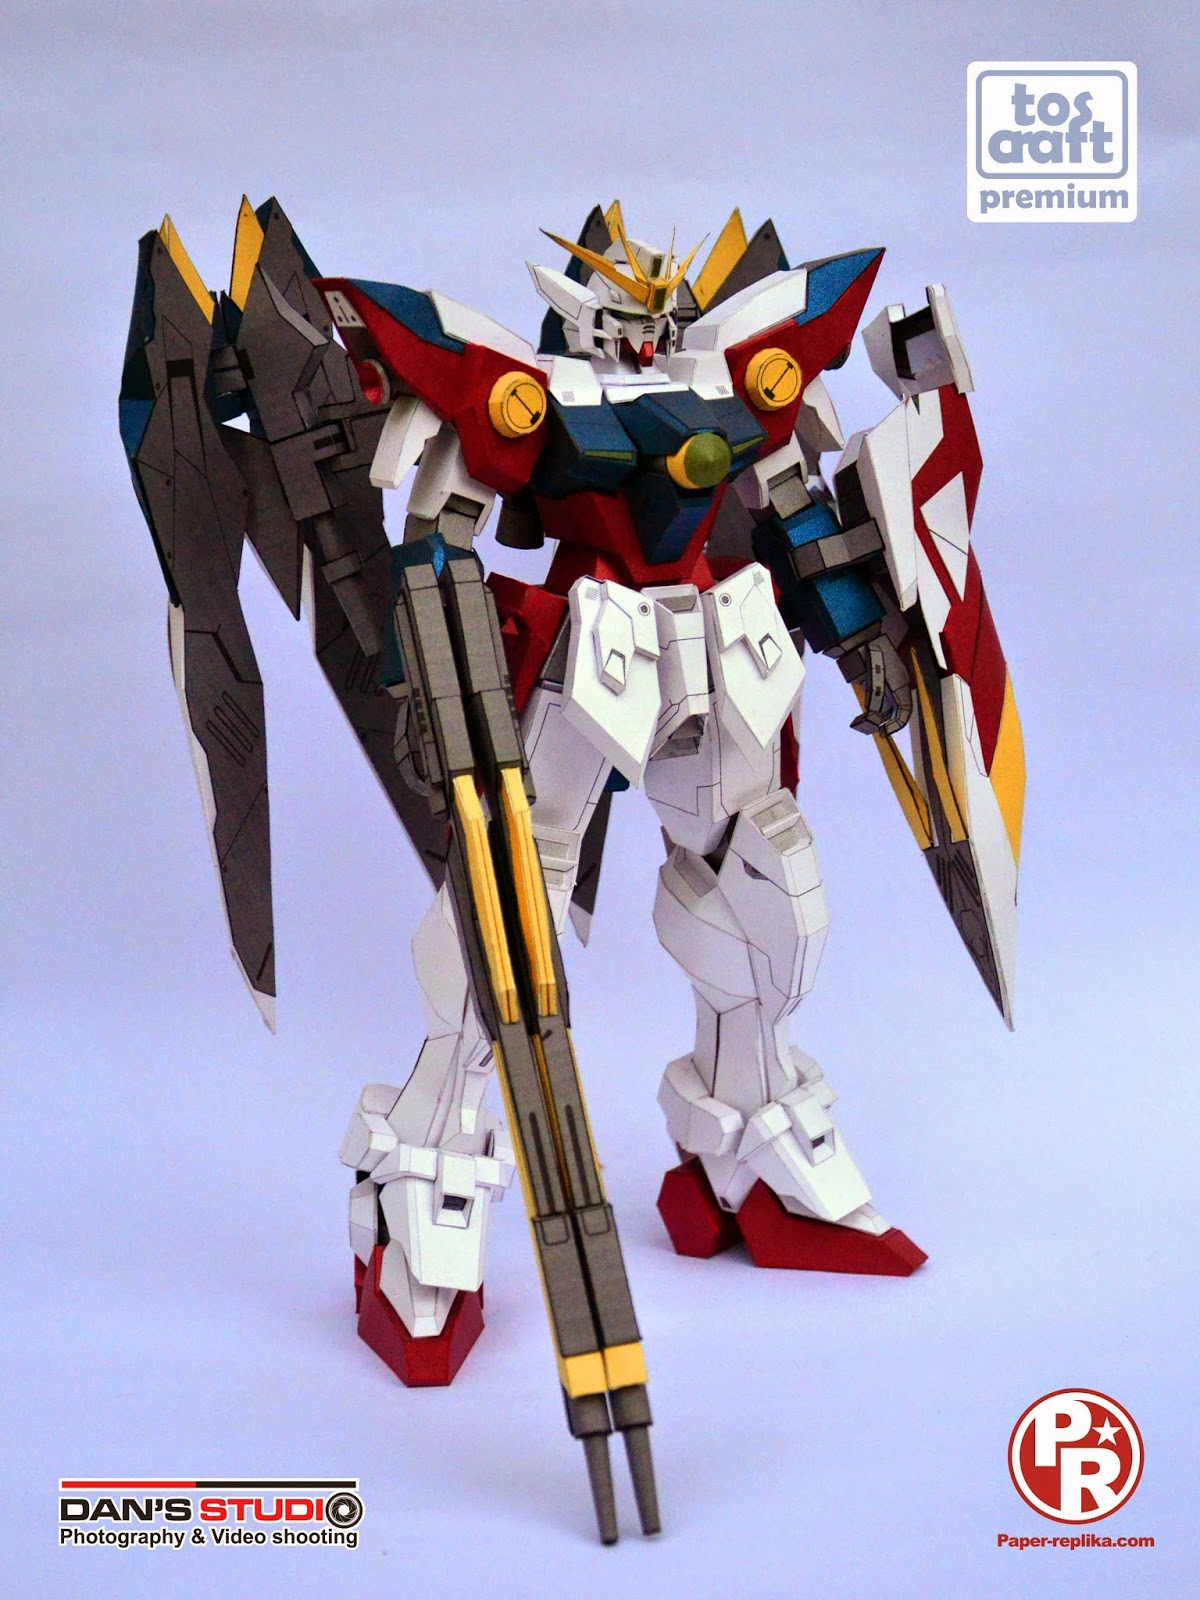 Tos-craft: WING ZERO Gundam 1:60 papercraft